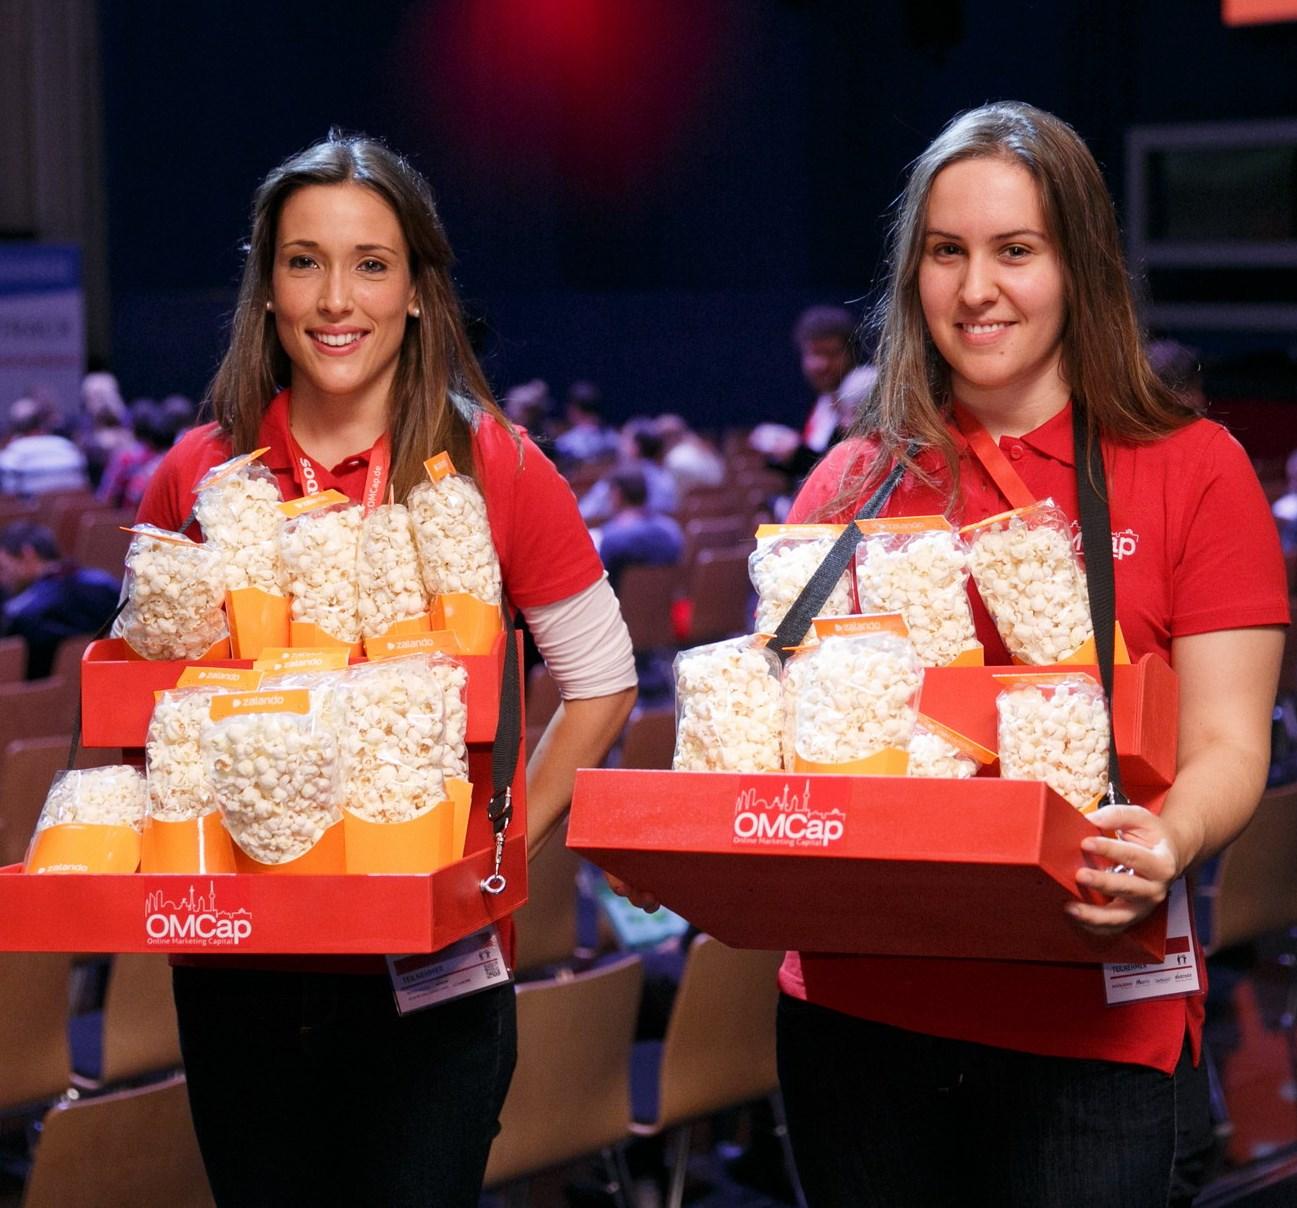 sponsoring-popcorn